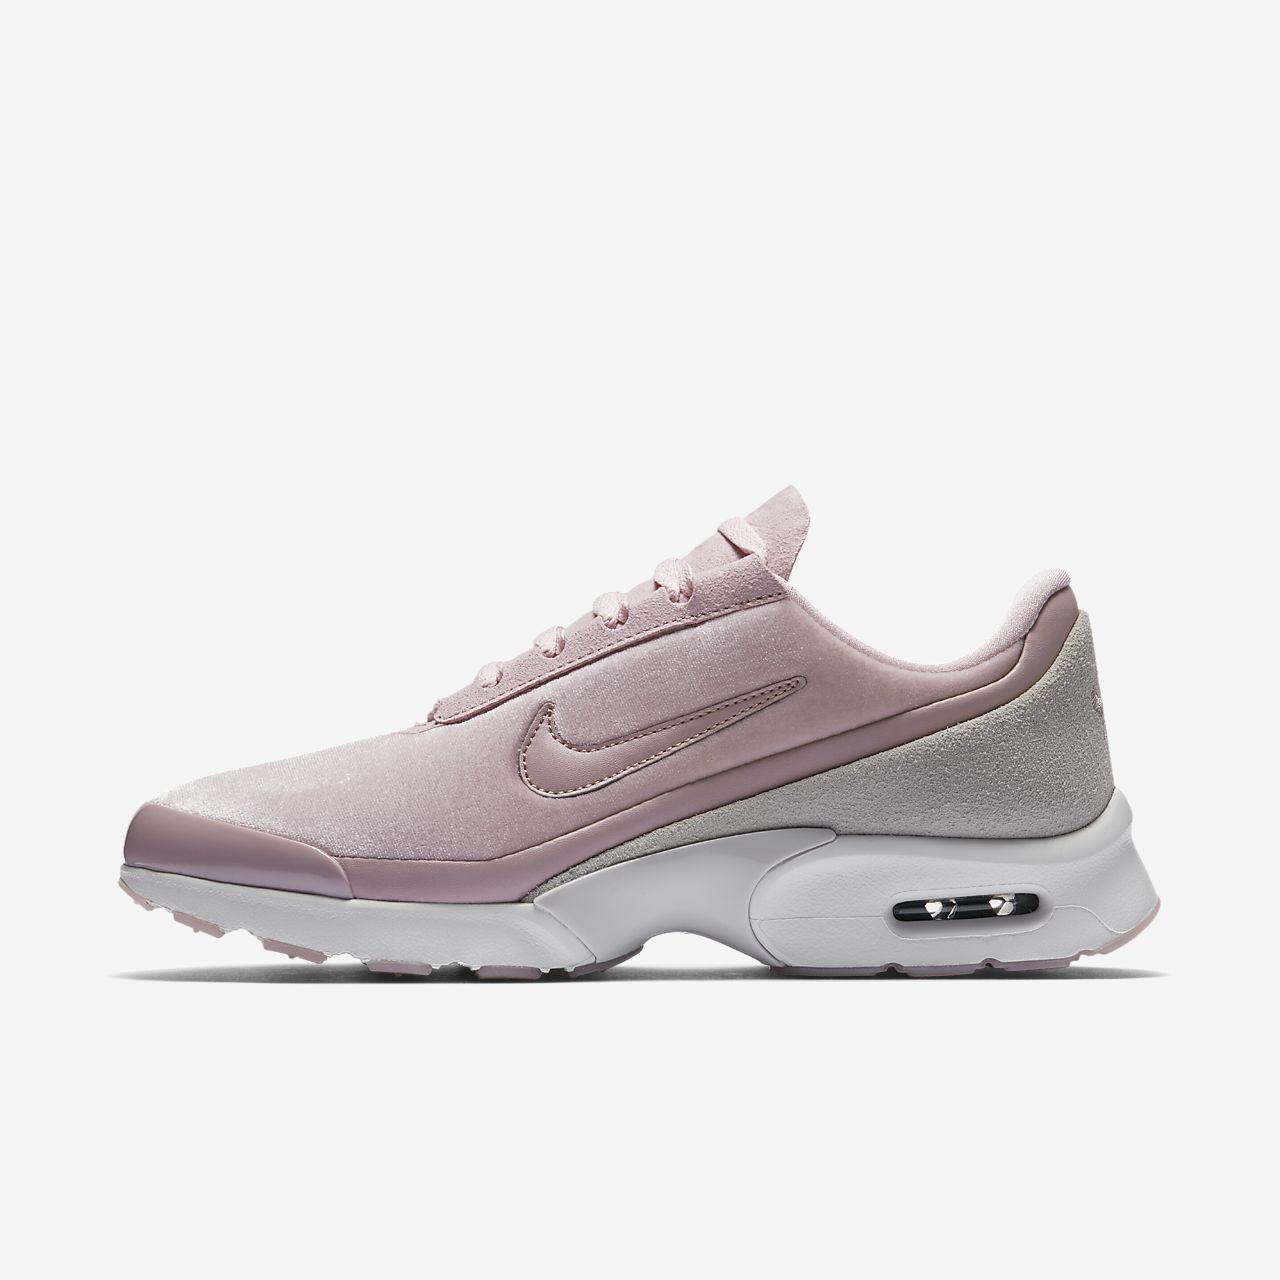 ... Nike Air Max Jewell LX Women's Shoe